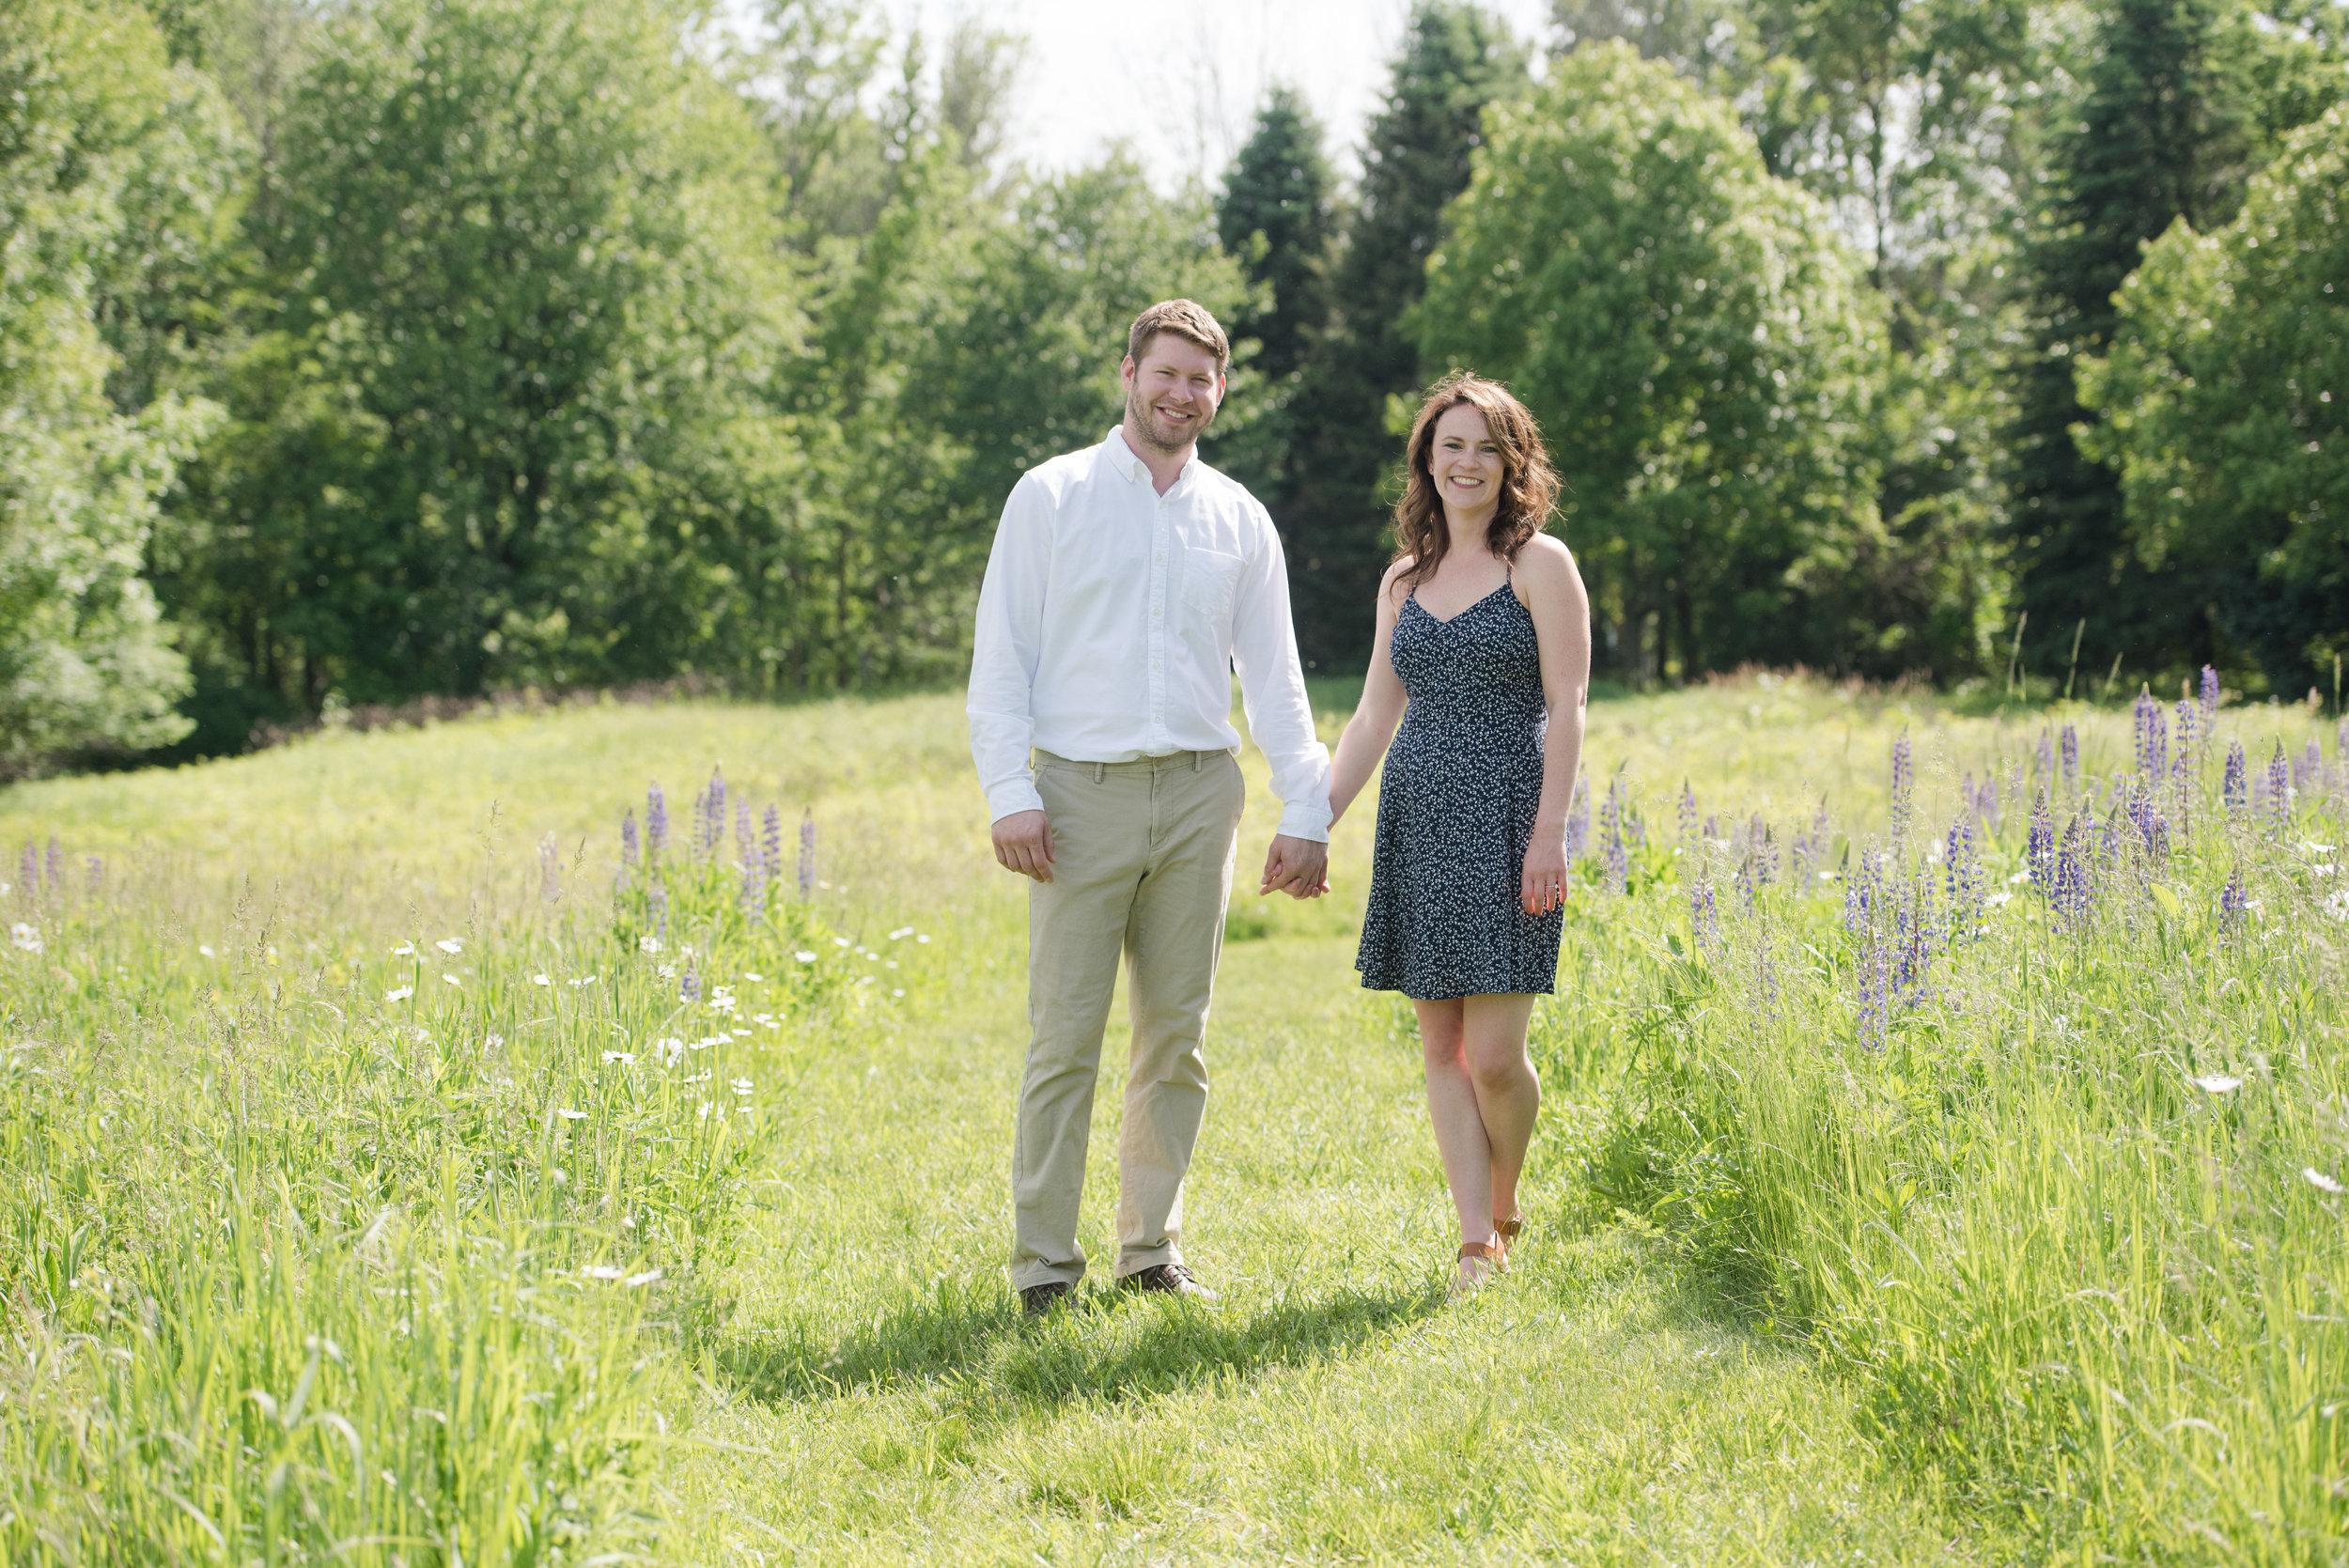 GALLERY-2019-6-9 Kaitlin, Justin & Liam Engagement 0588 78.jpg